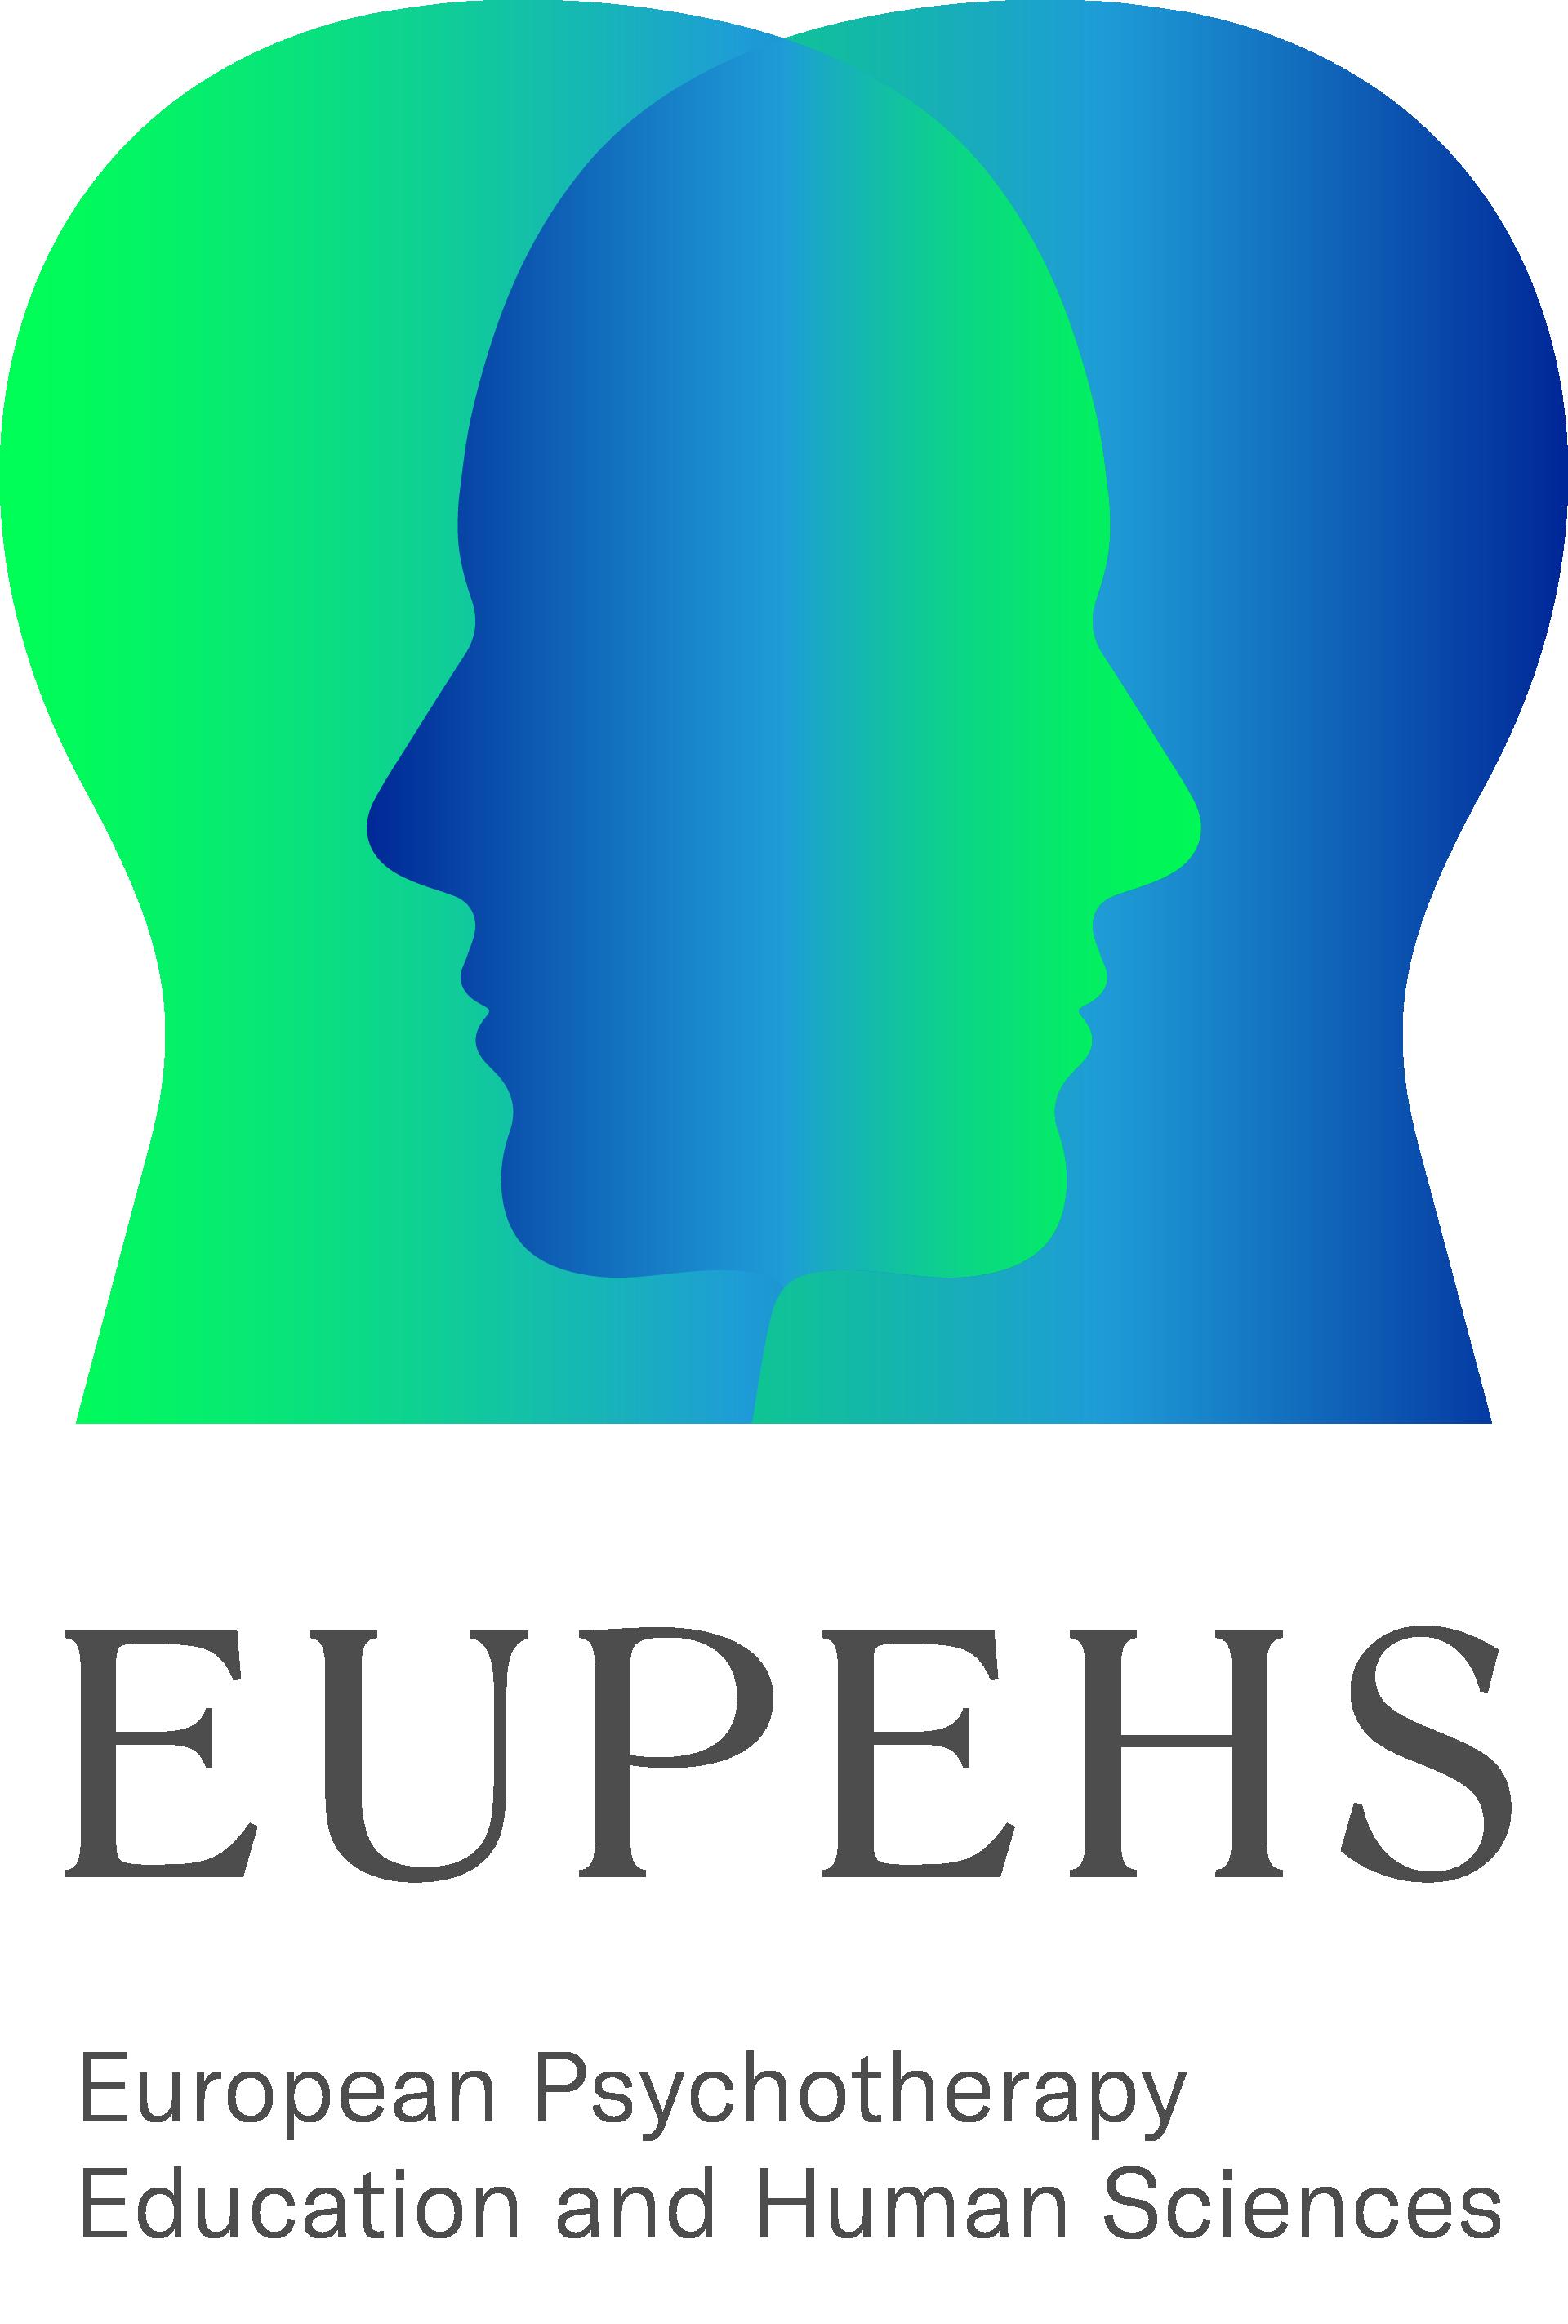 EUPEHS